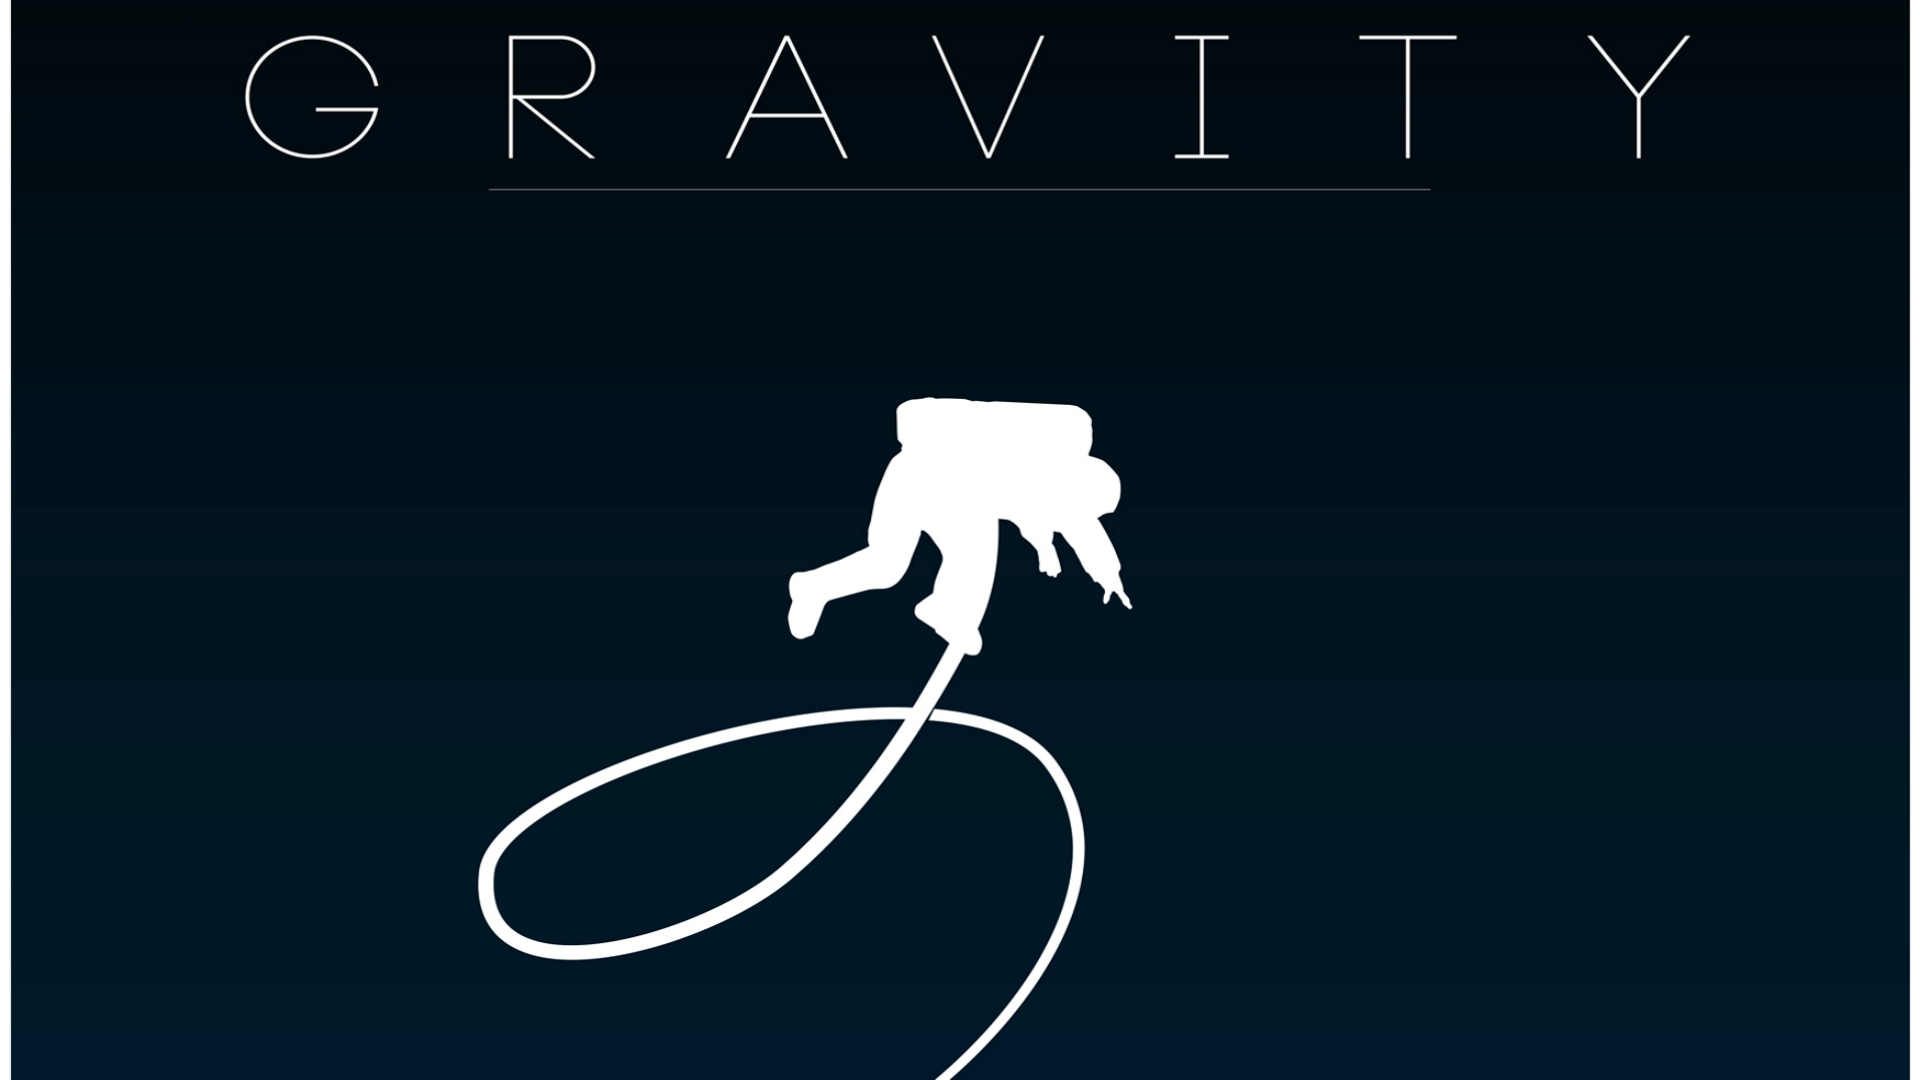 Gravity Movie wallpaper 3